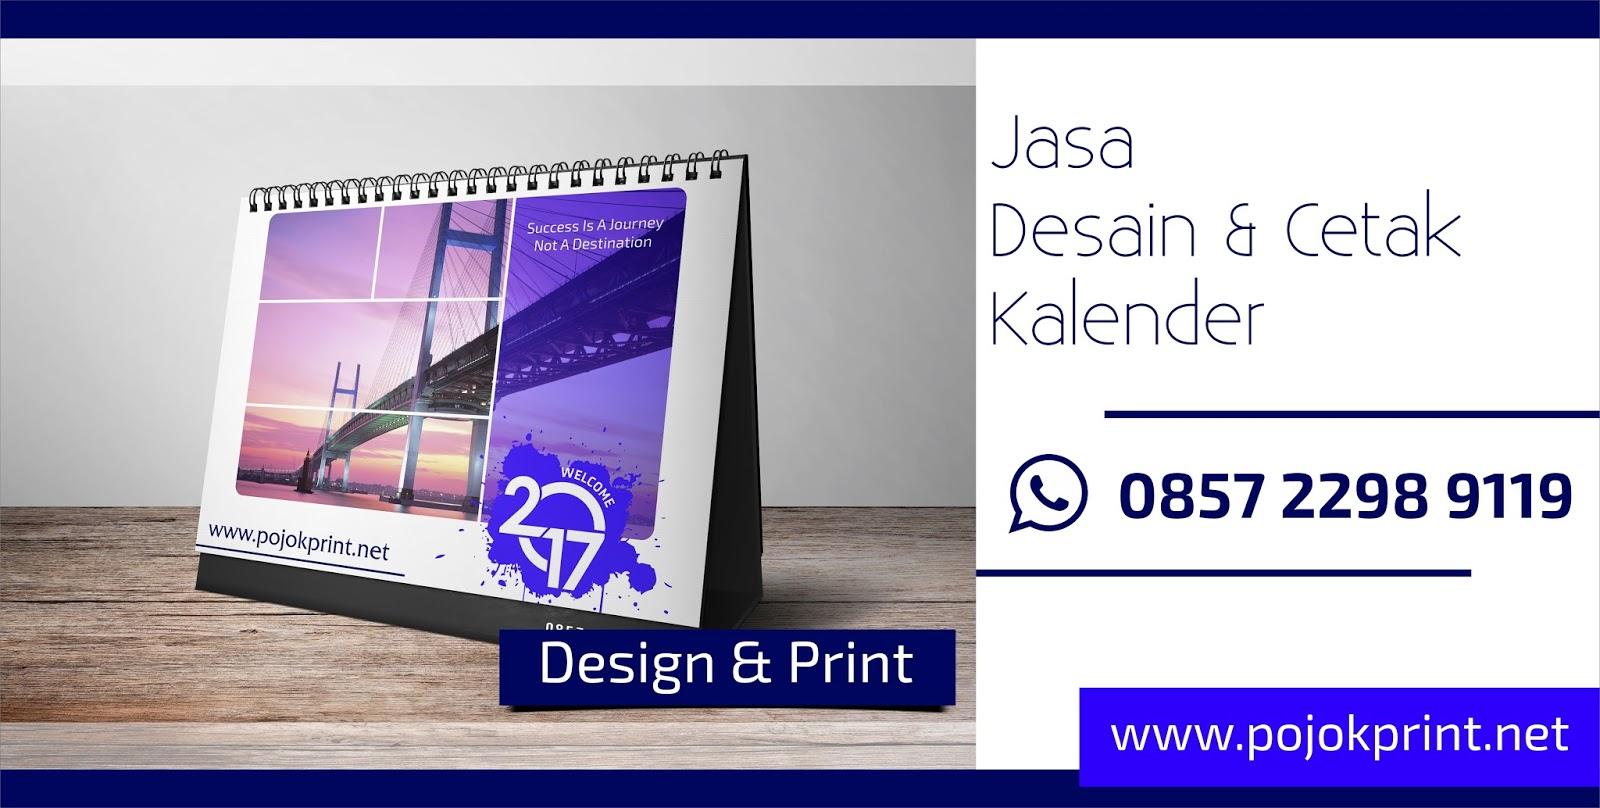 Jasa-Desain-&-Cetak-Kalender